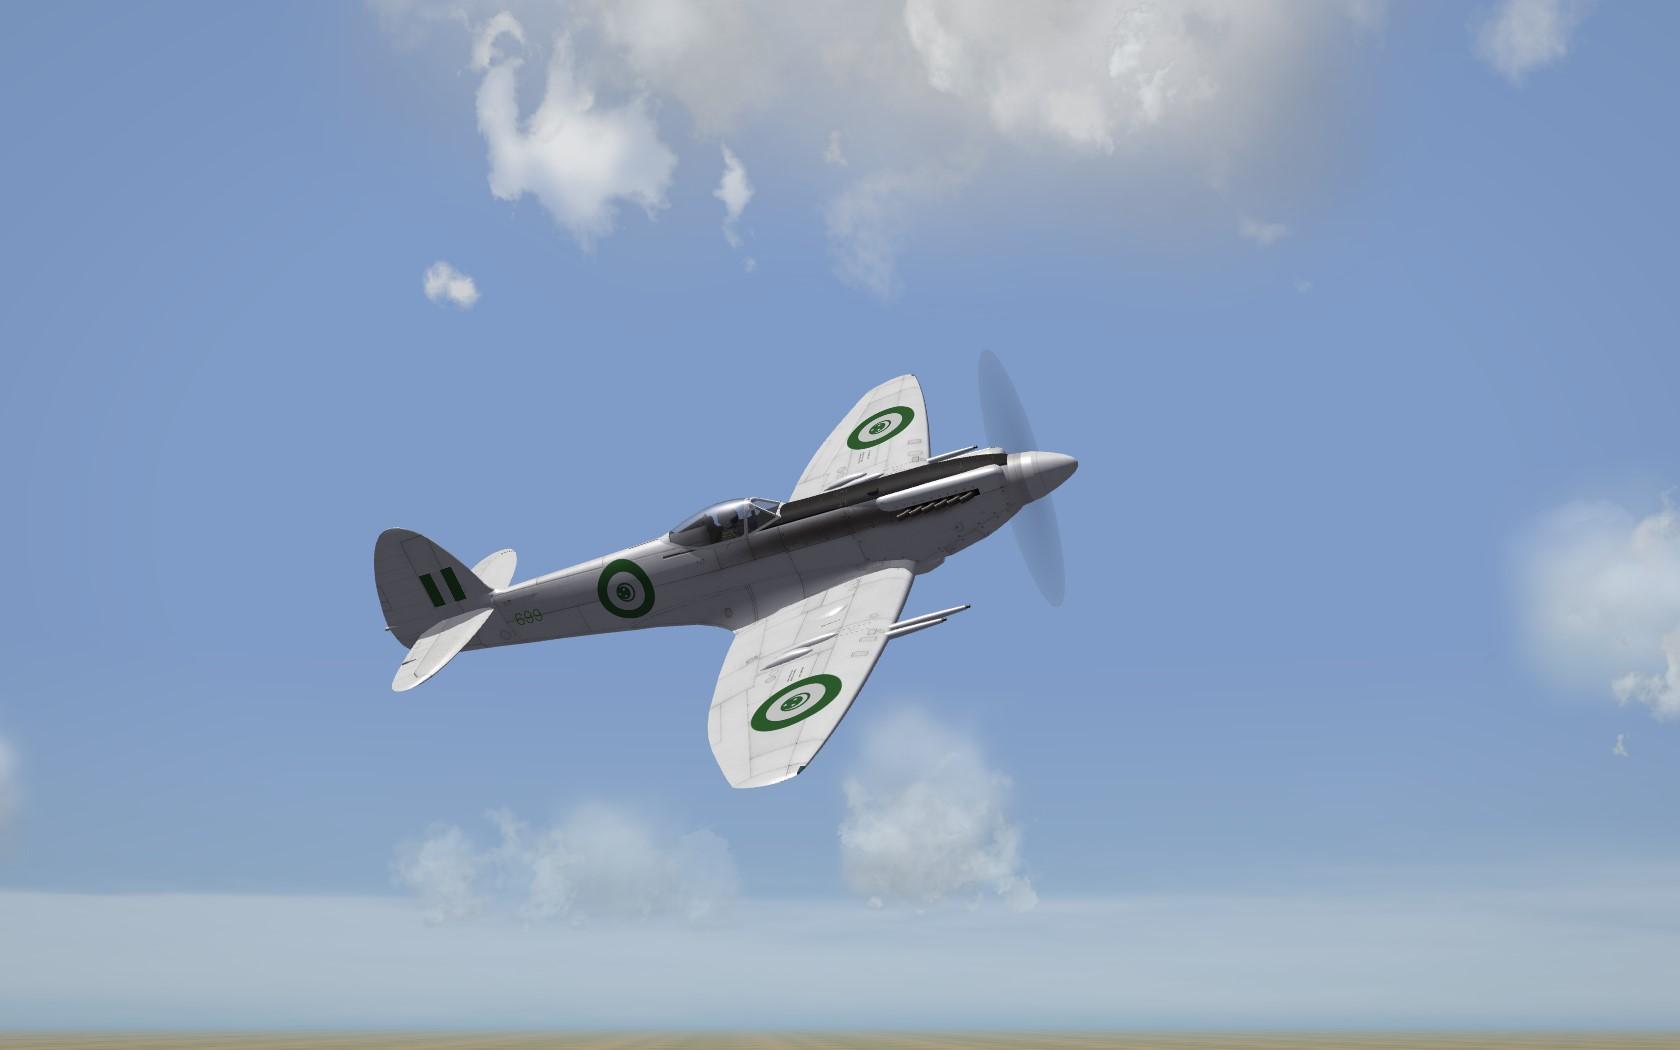 EAF Supermarine Spitfire F Mk 22 White DLC 29